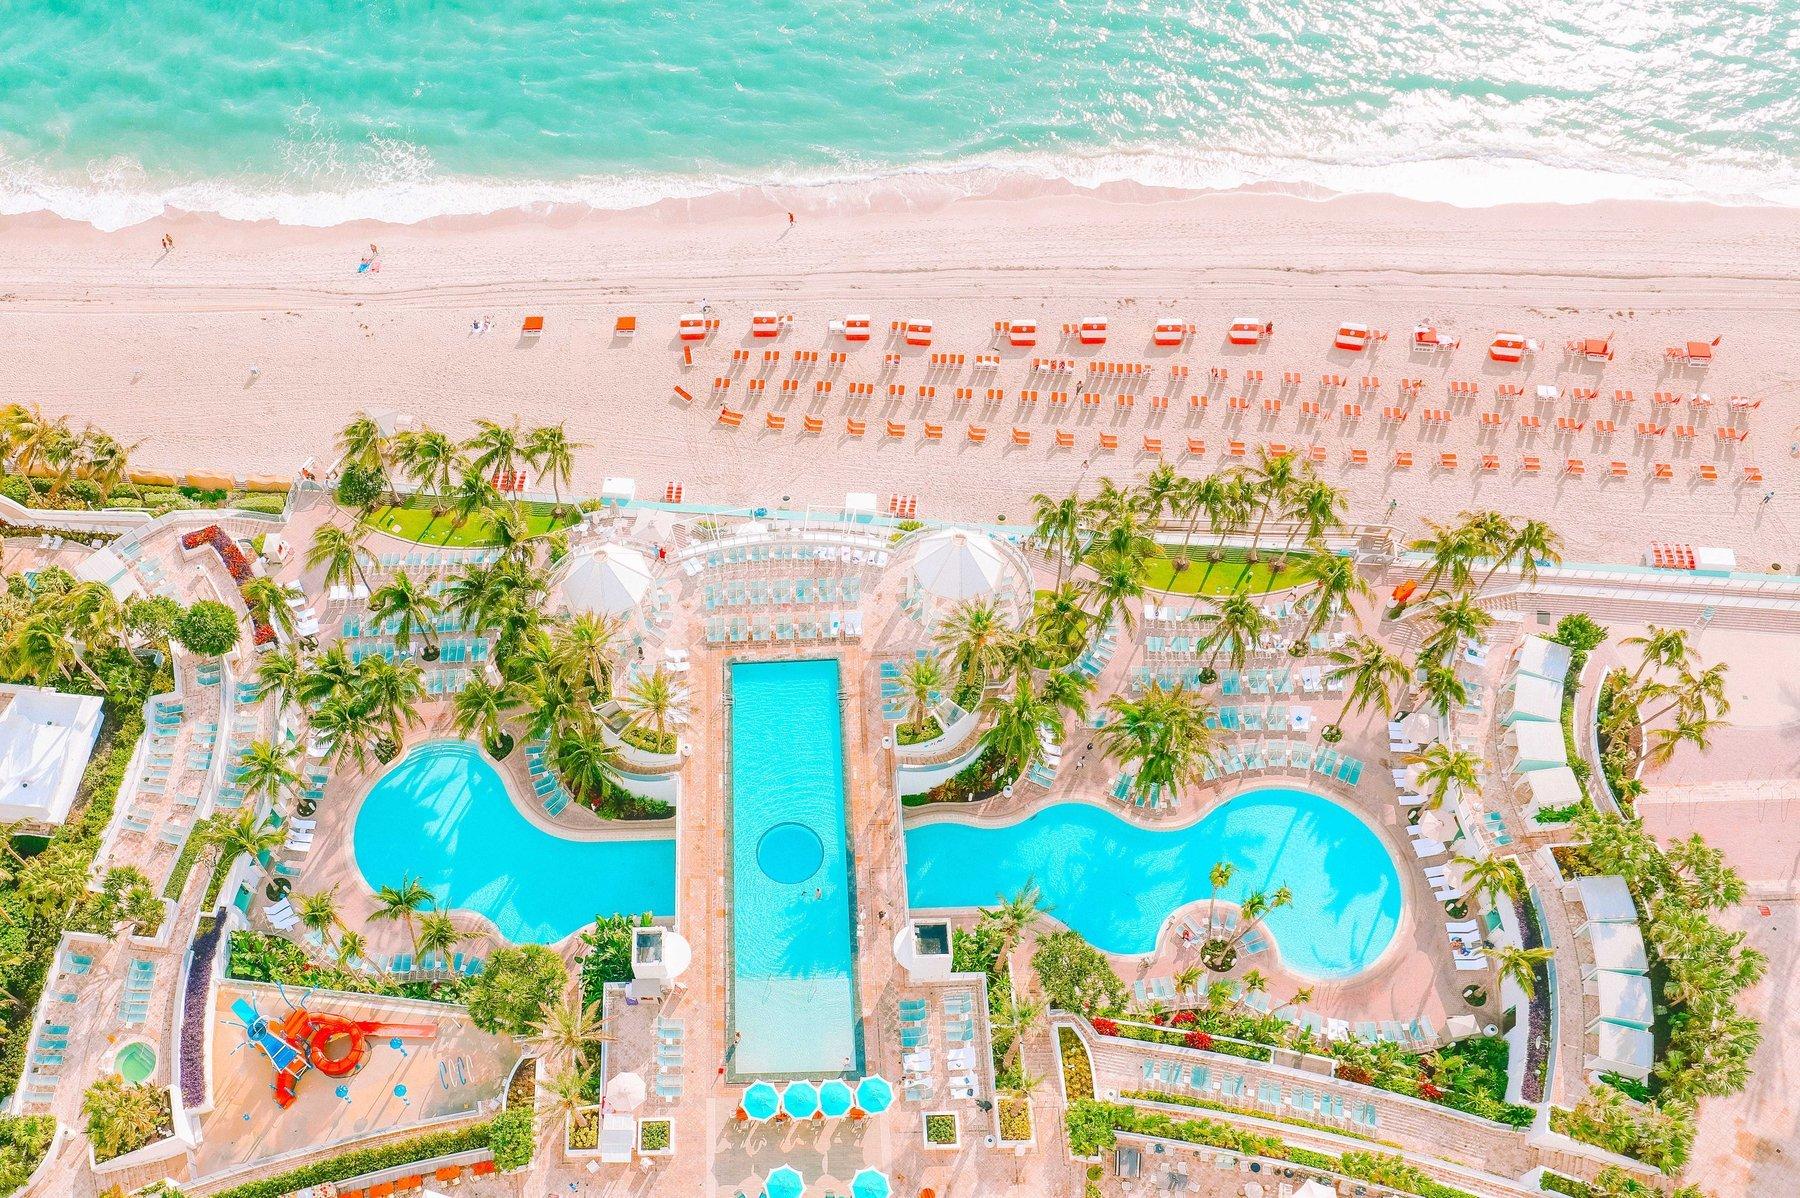 Birds eye view of The Diplomat Beach Resort Pool and Beach in So